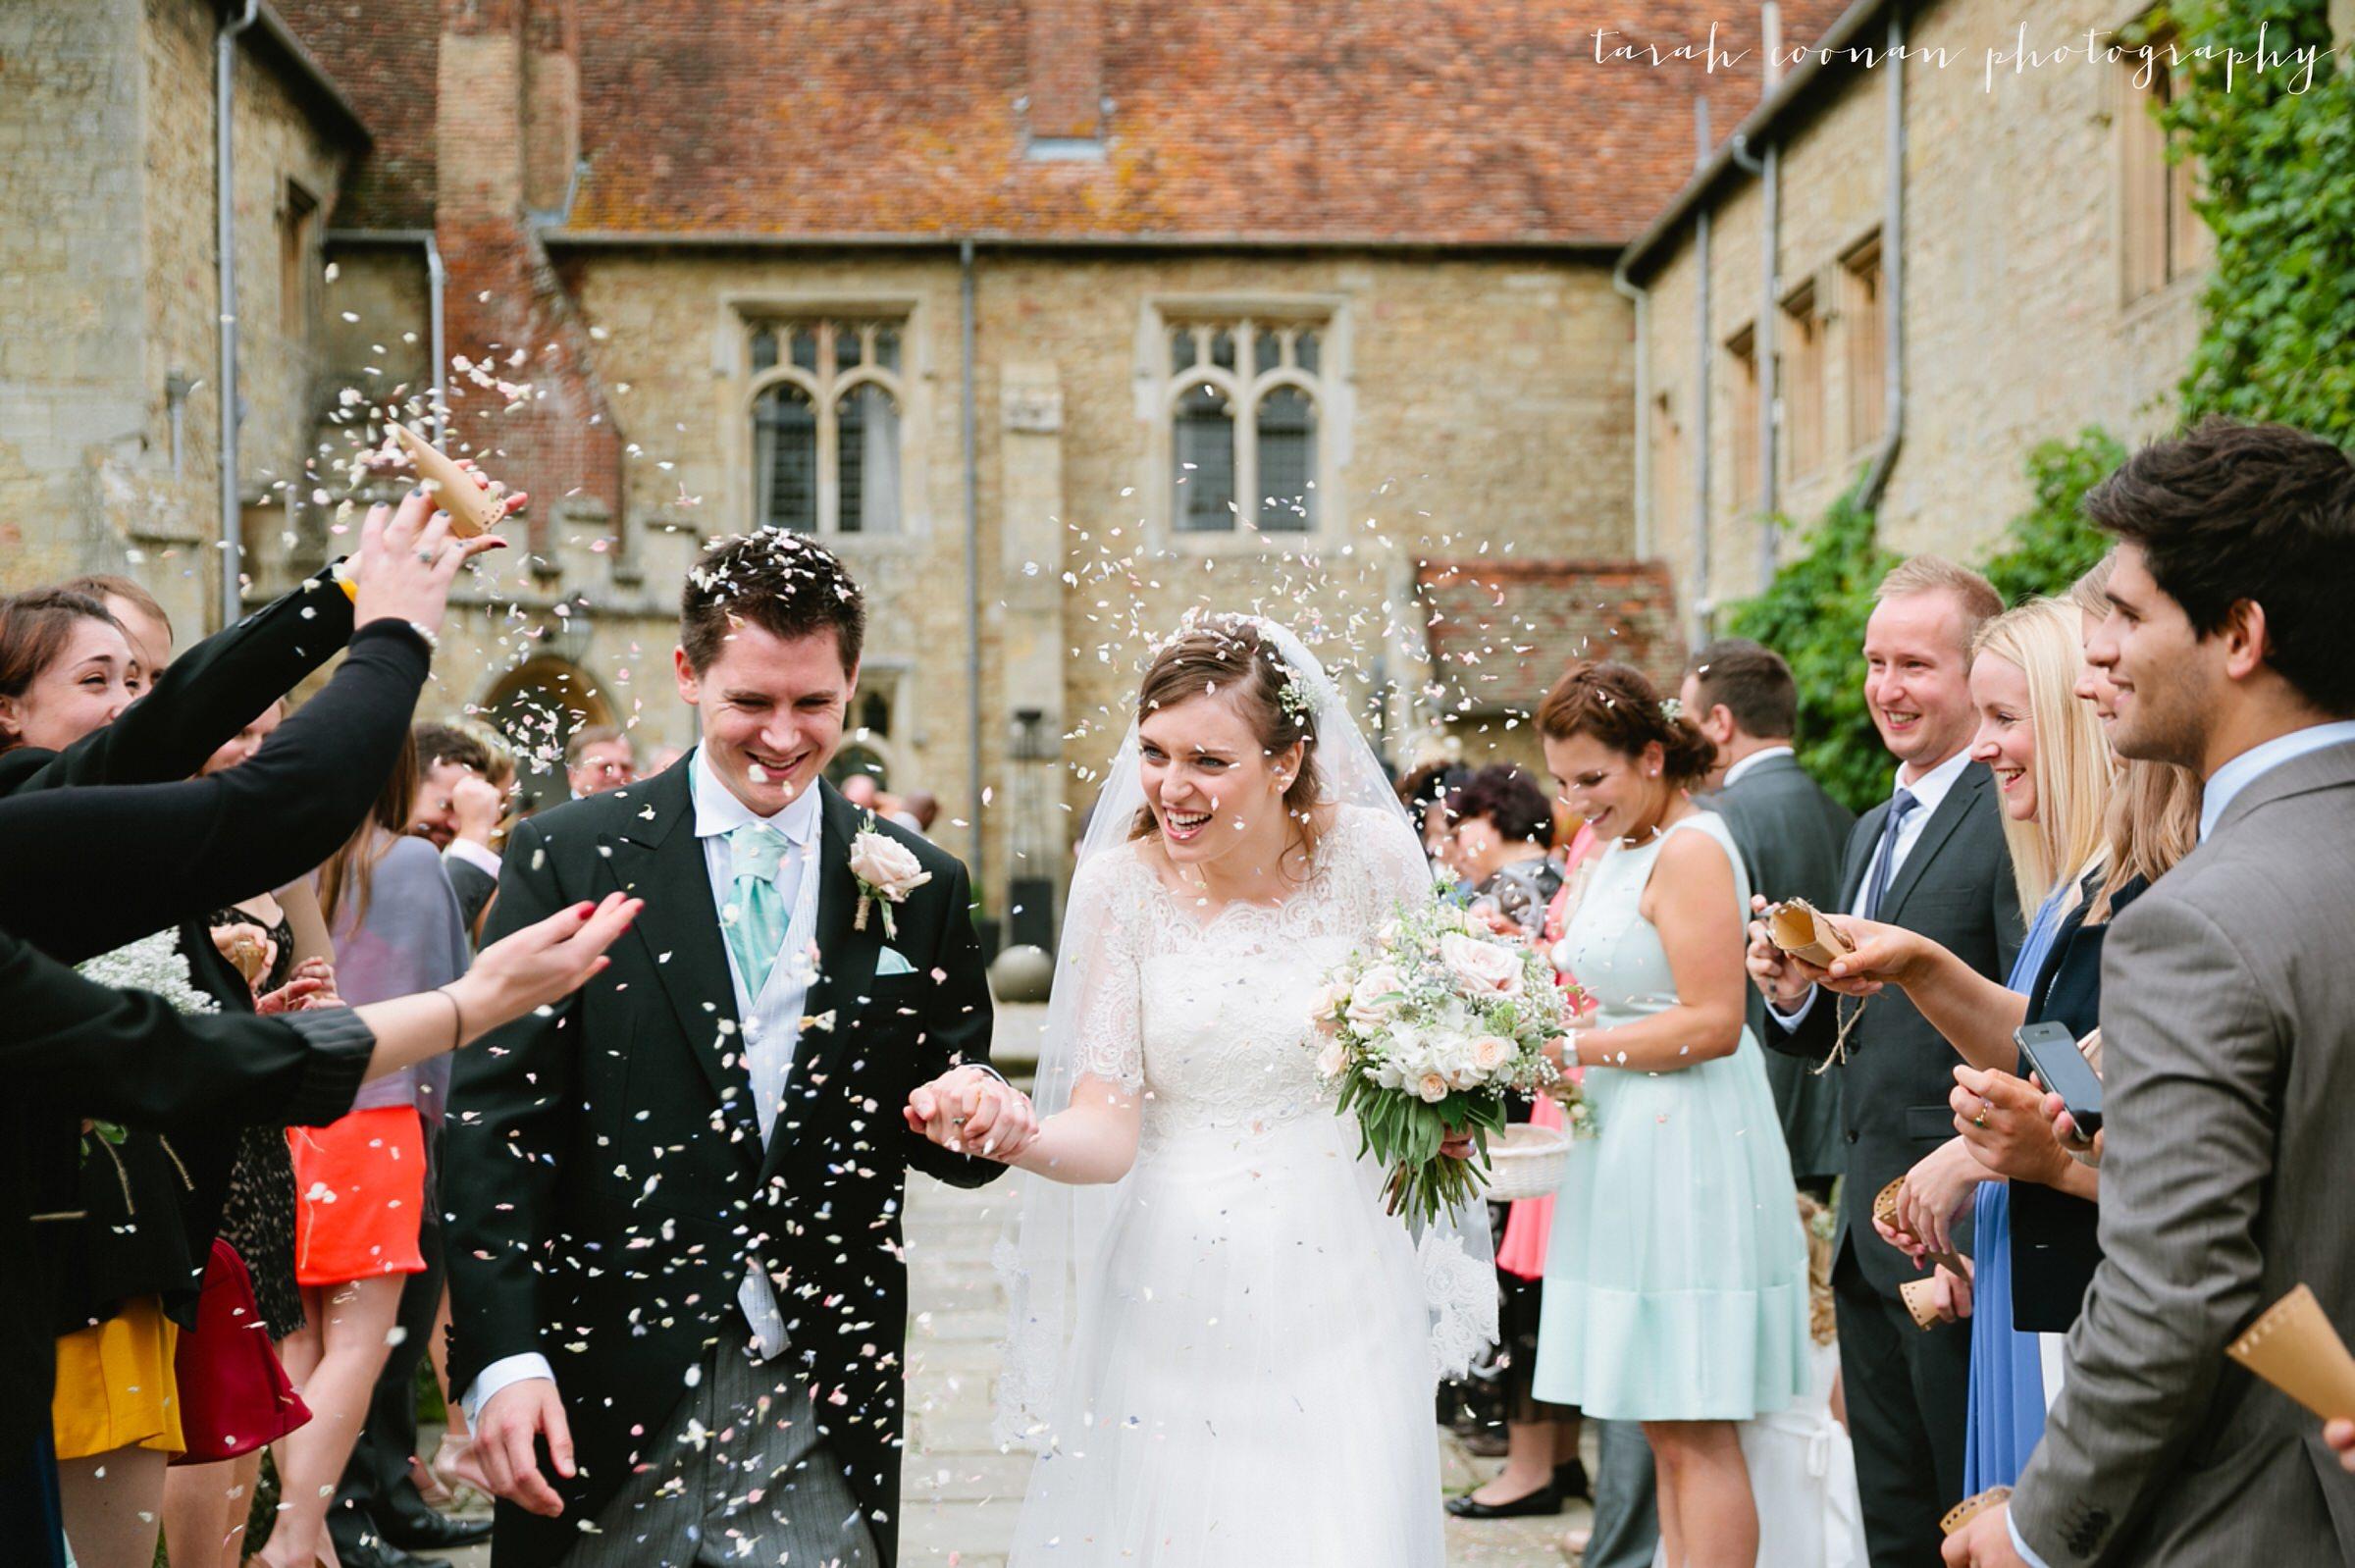 brighton-wedding-photographer33